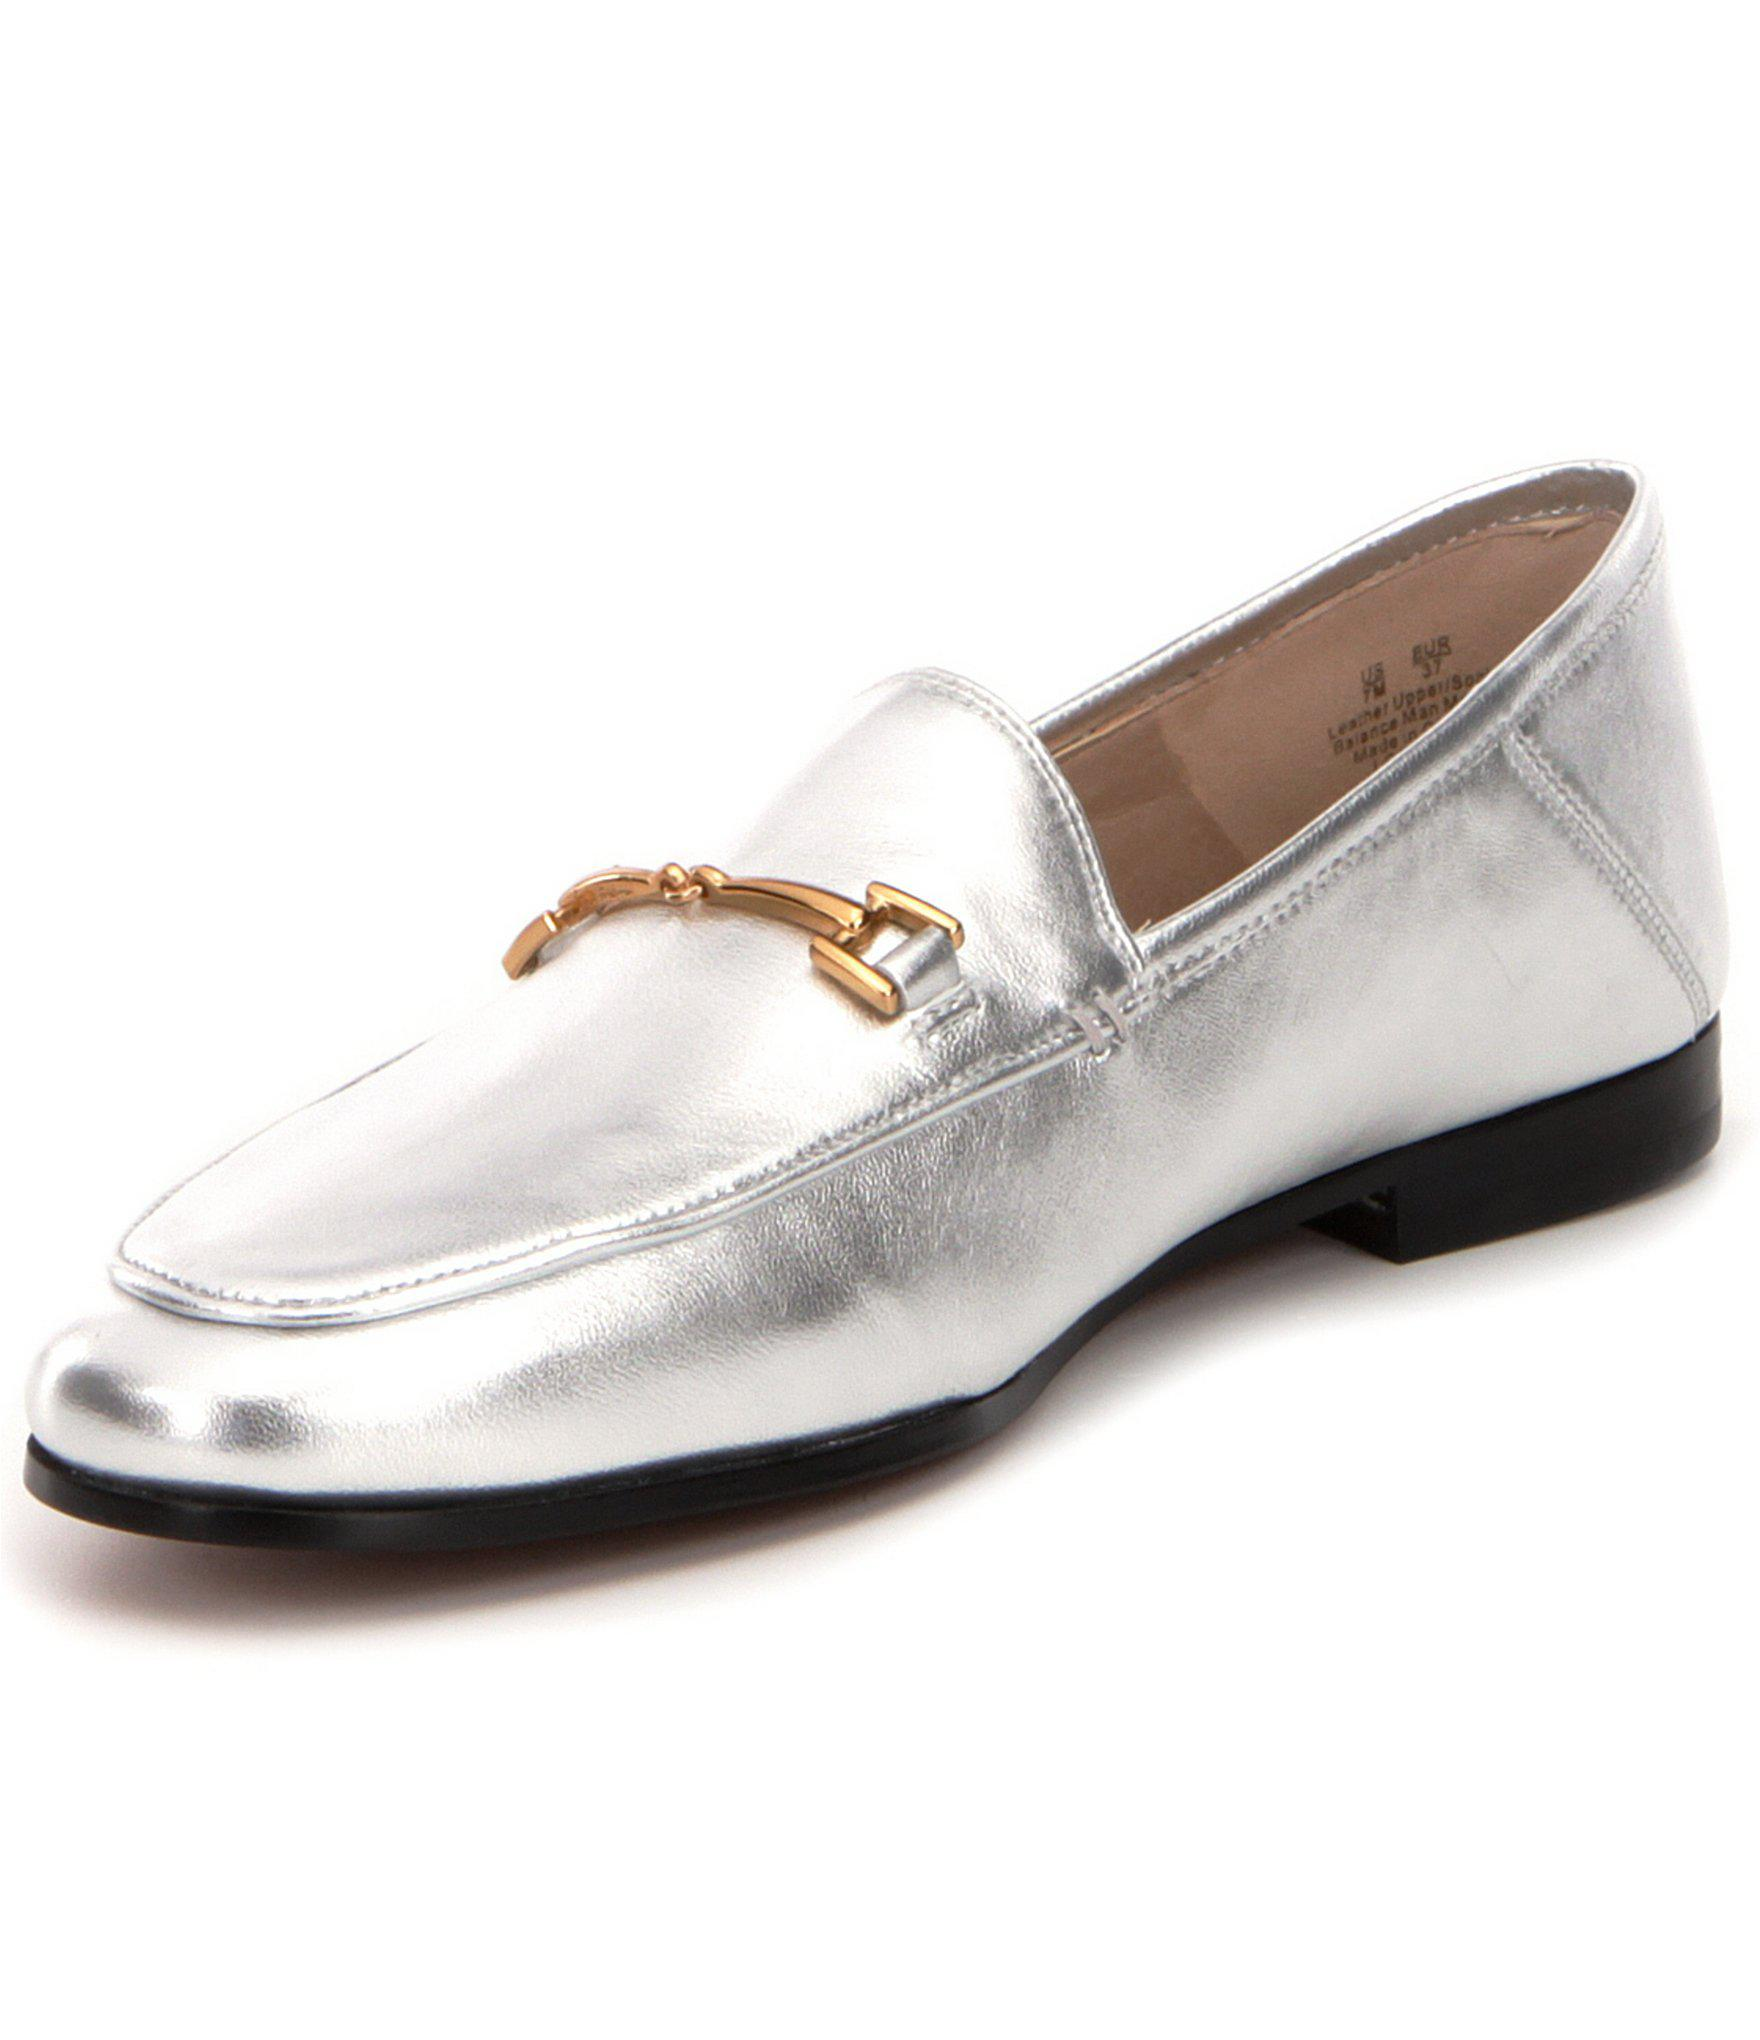 939df229412c1 Lyst - Sam Edelman Loraine Leather Loafers